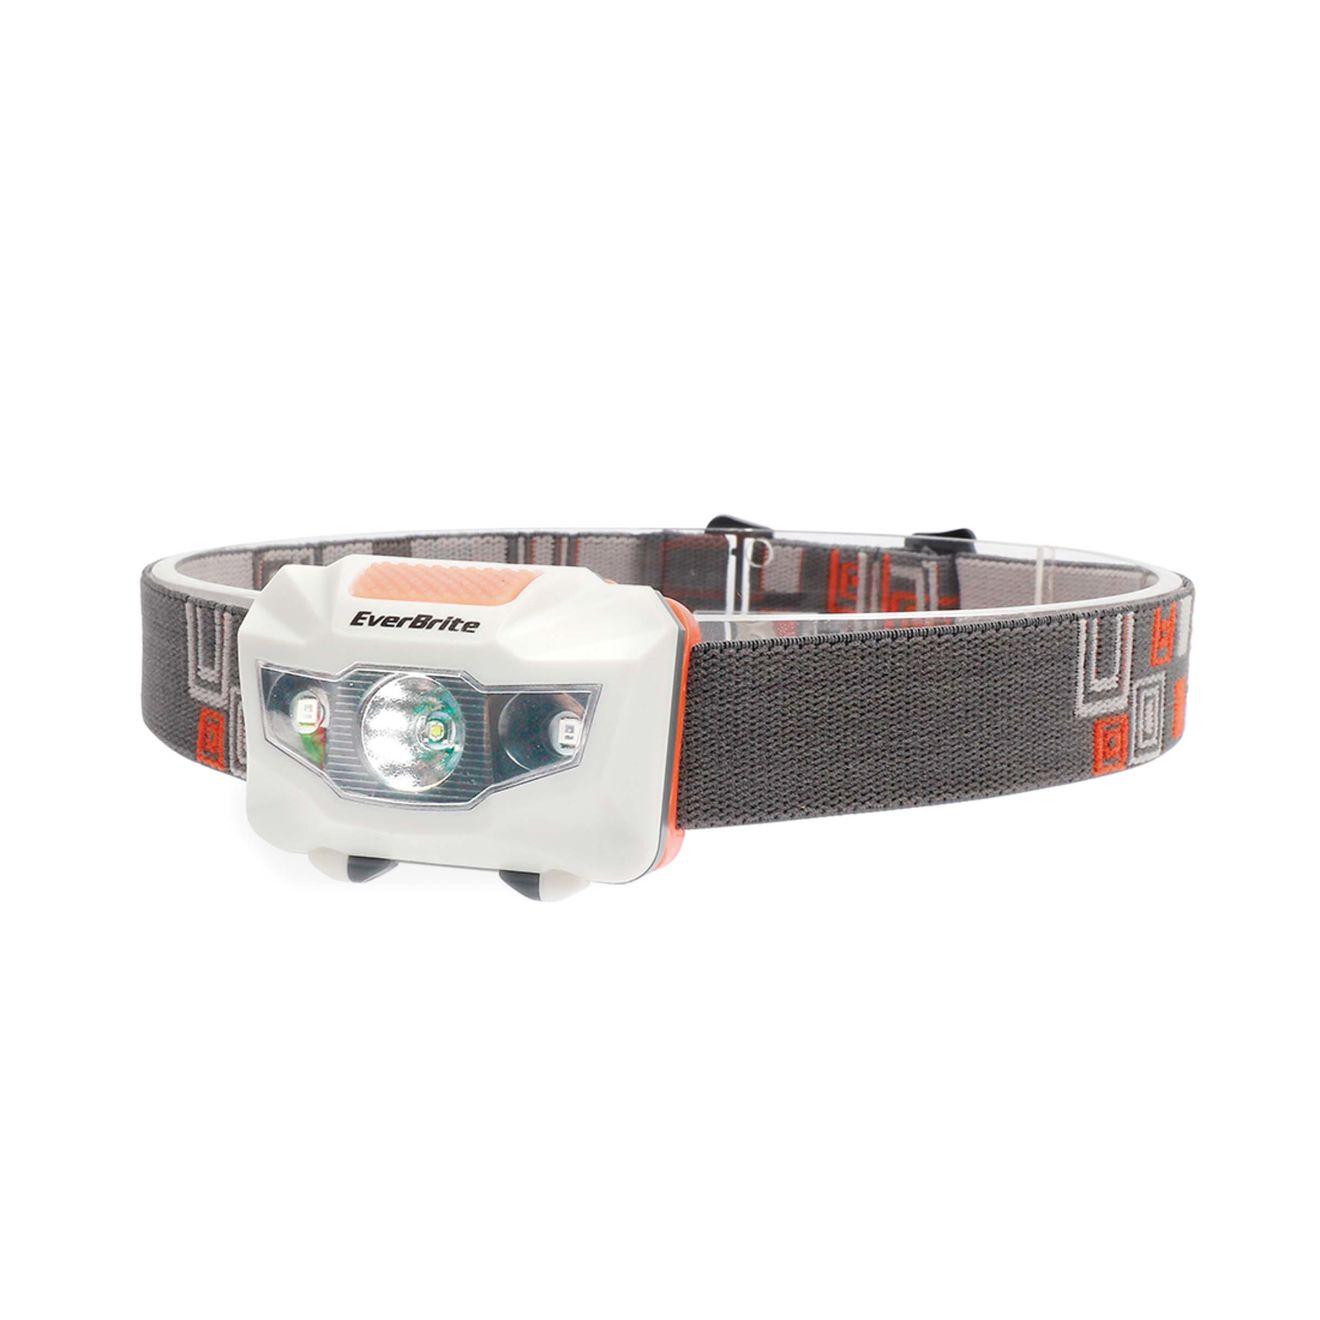 EverBrite 100 Lumen 2 LED Headlight